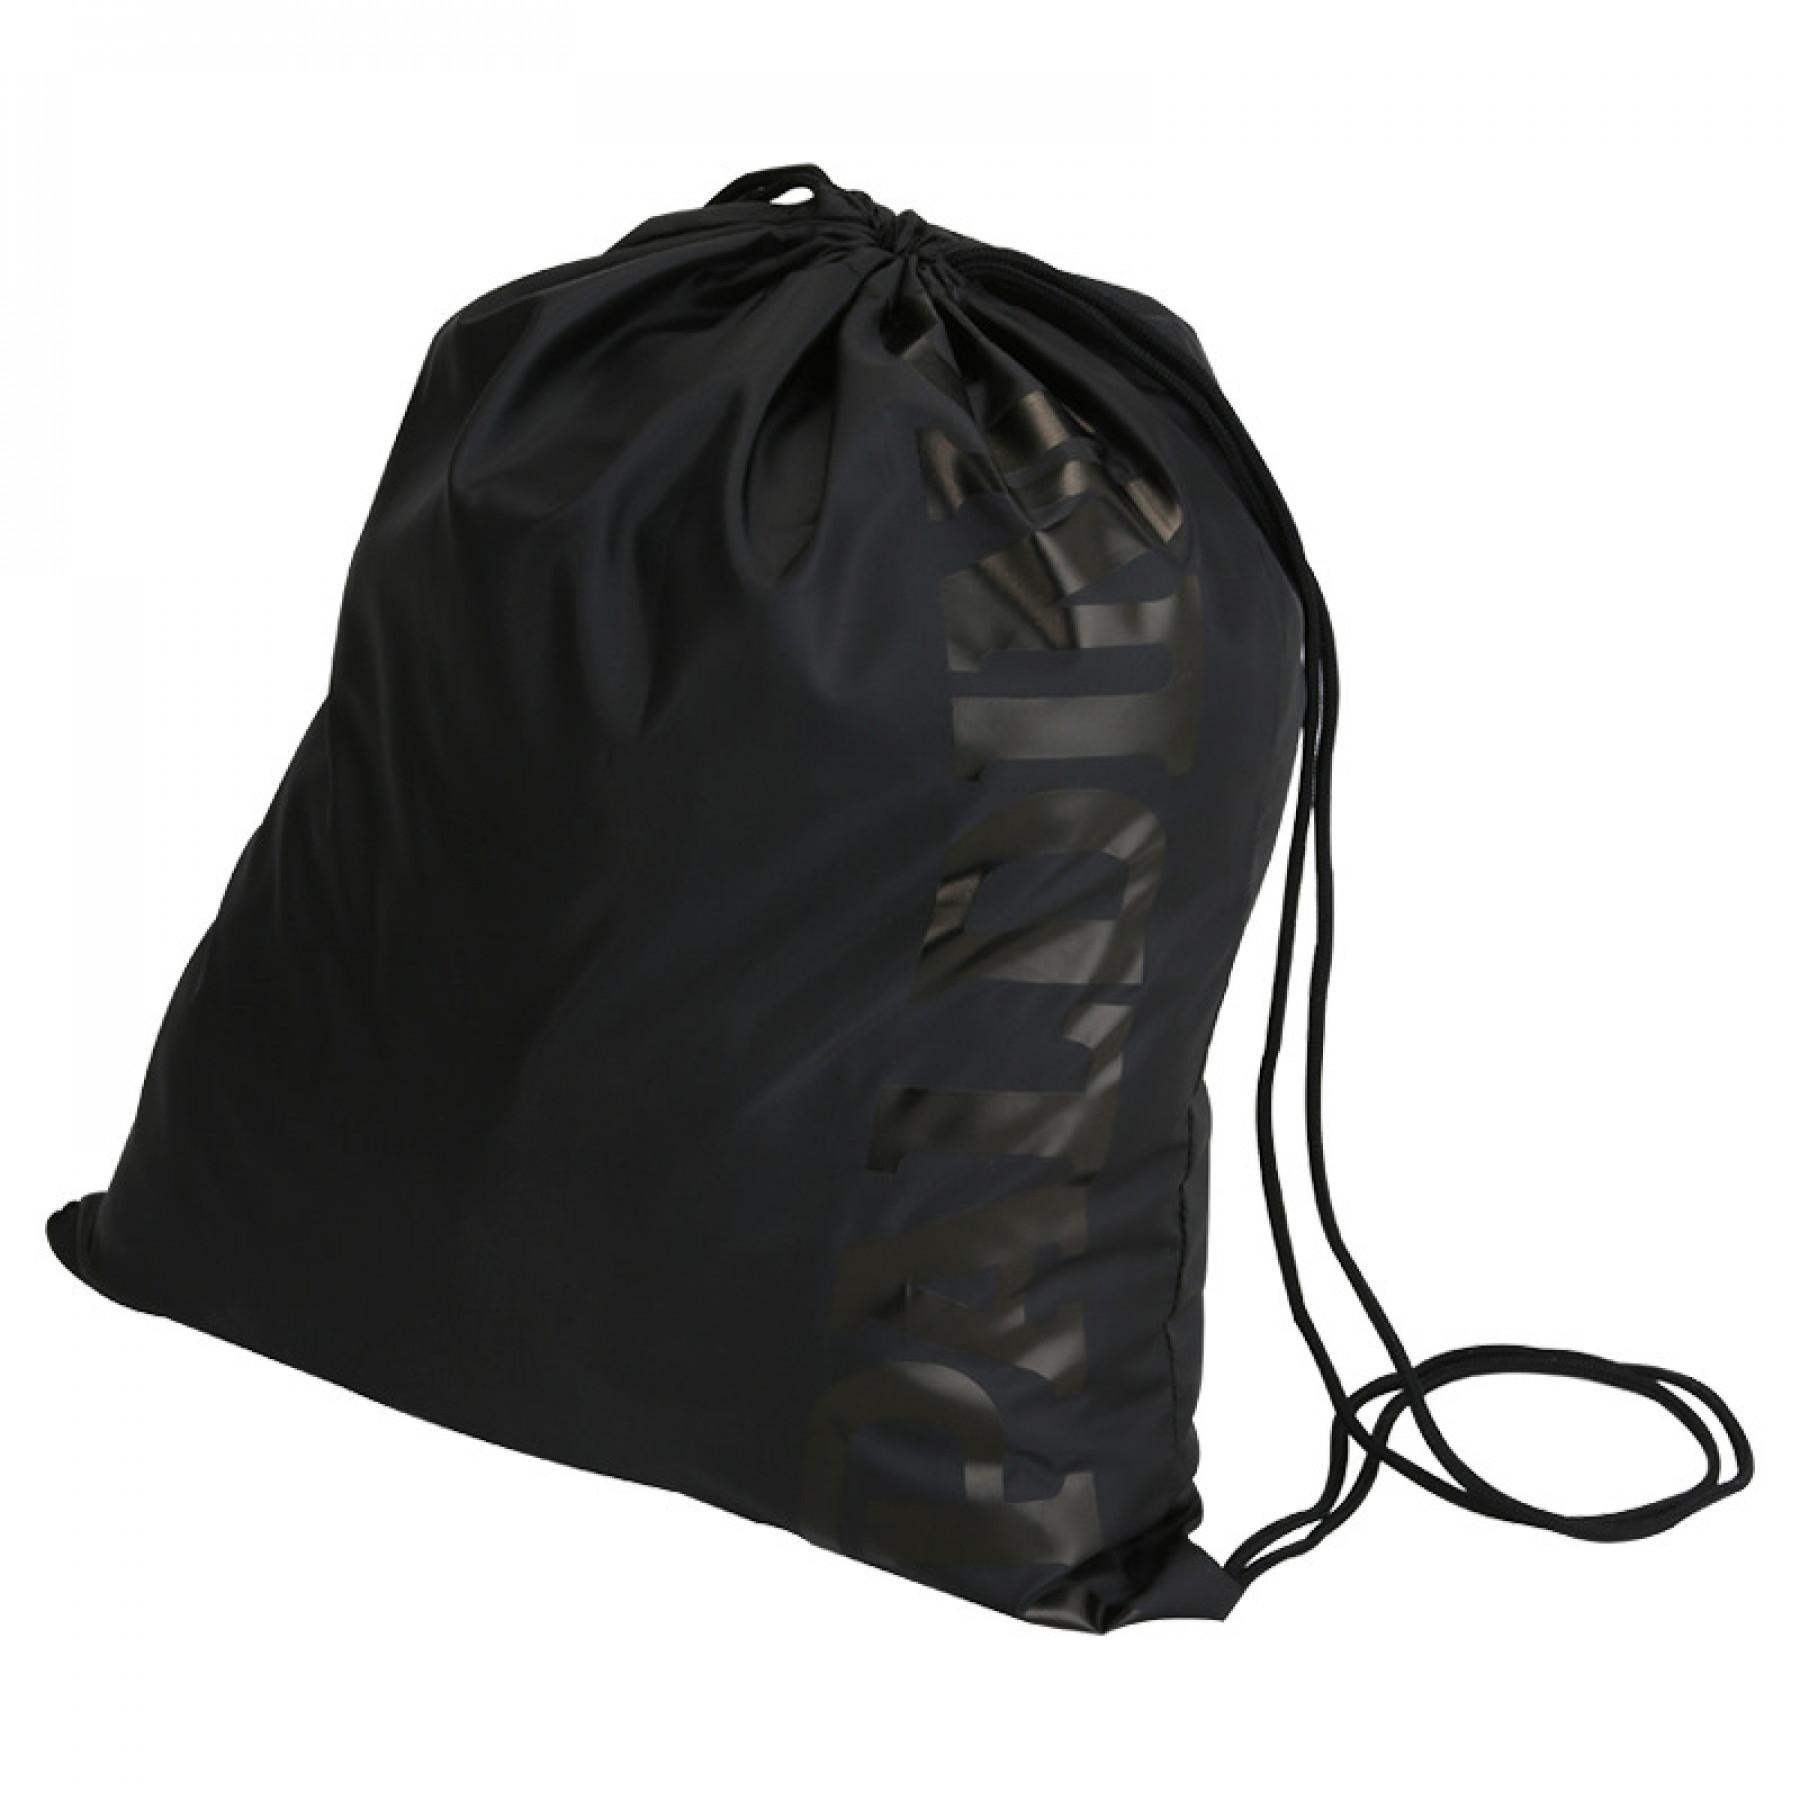 Spalding Sports Bag